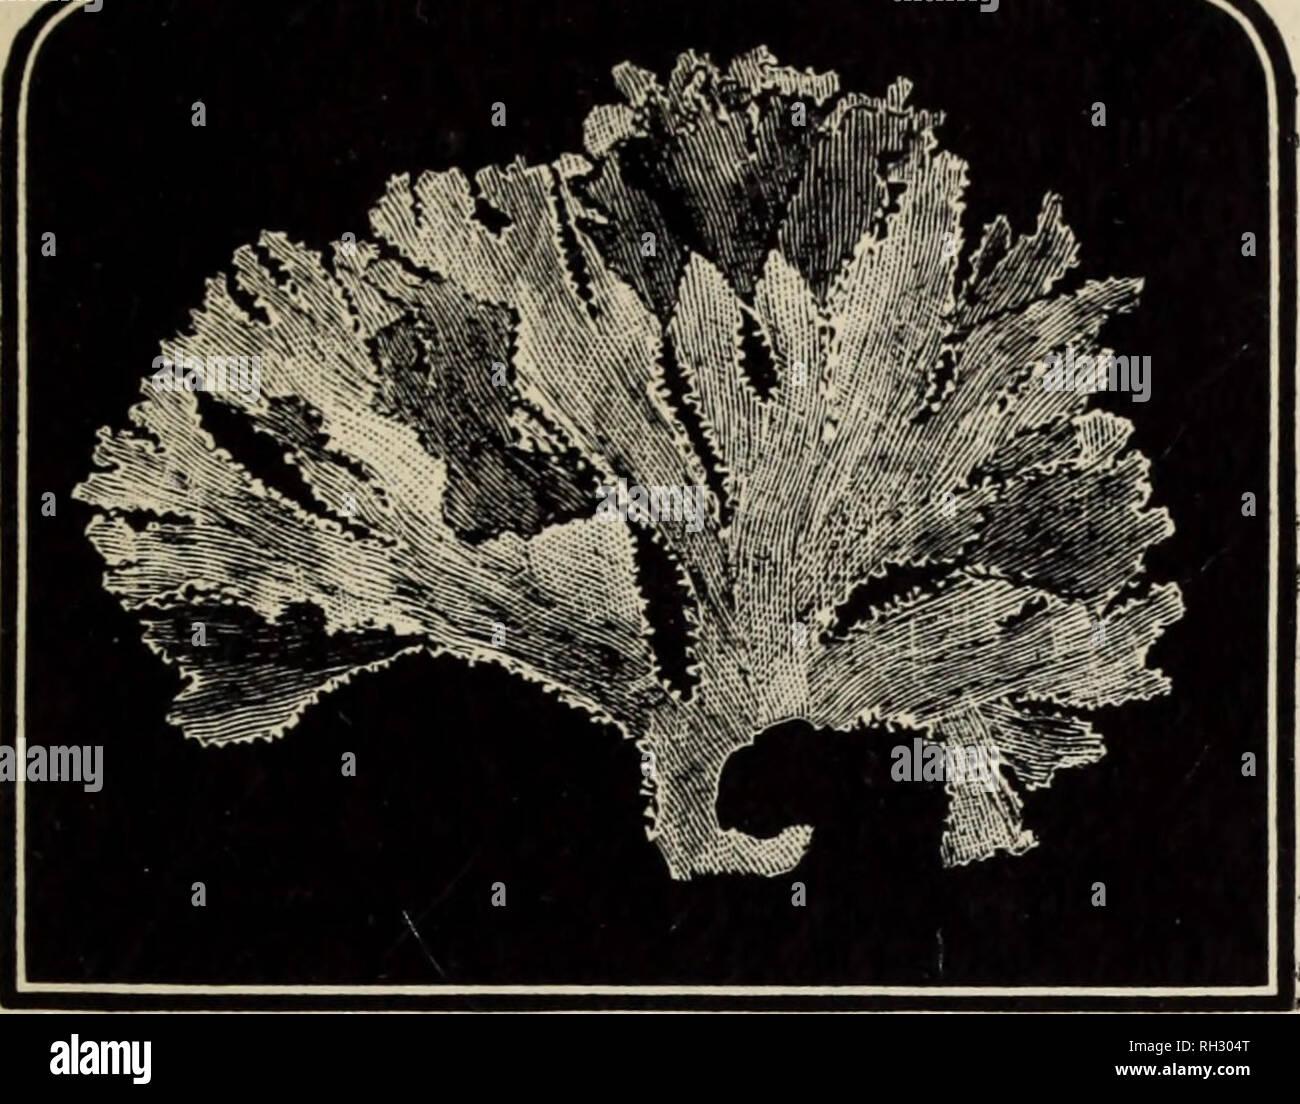 Seaweeds Stock Photos & Seaweeds Stock Images - Page 7 - Alamy